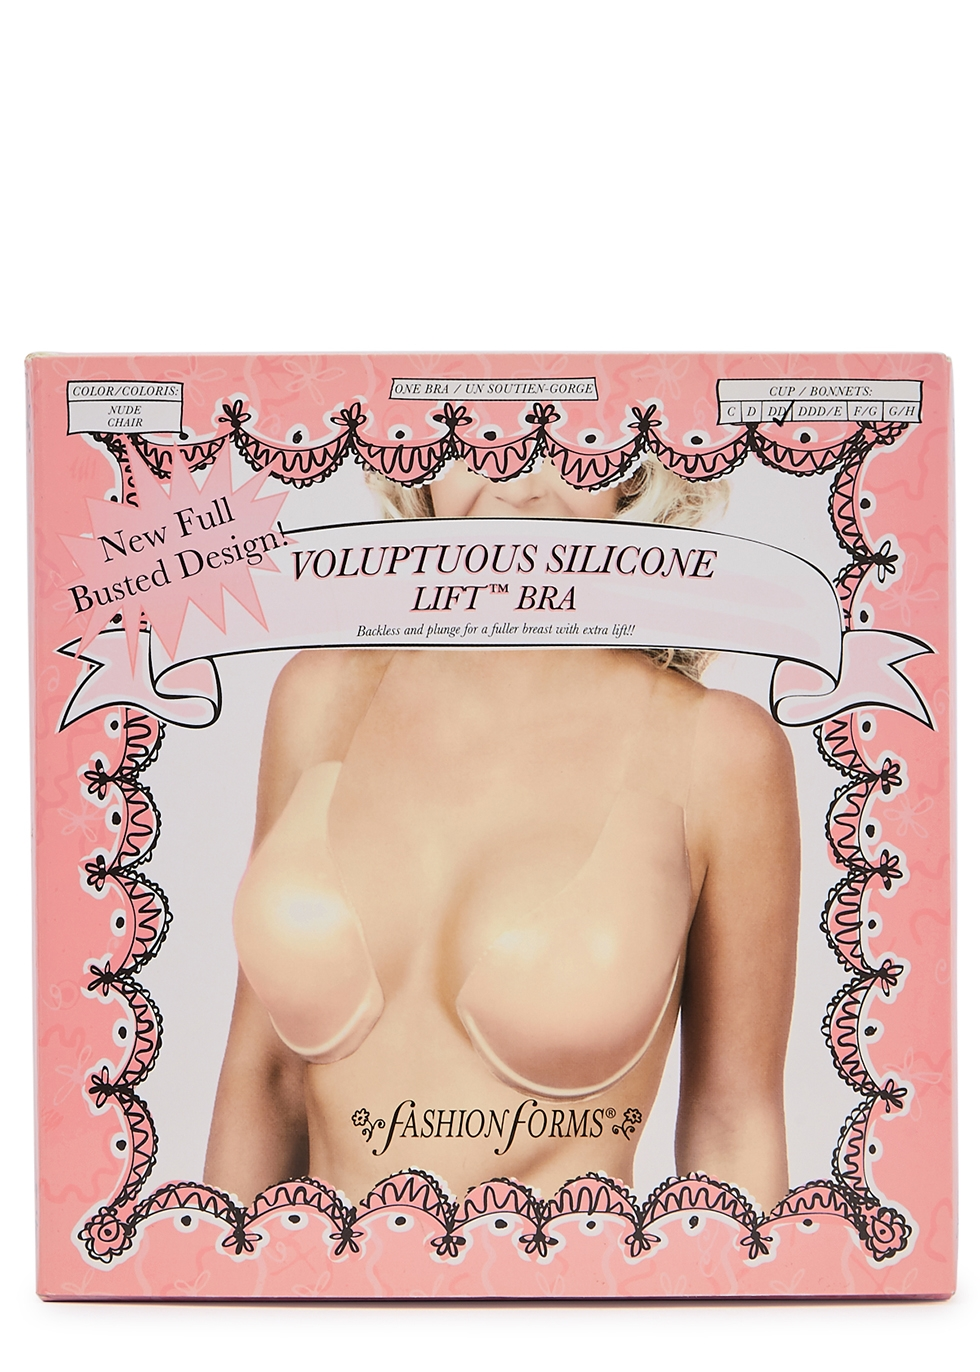 Voluptuous halterneck adhesive silicone bra